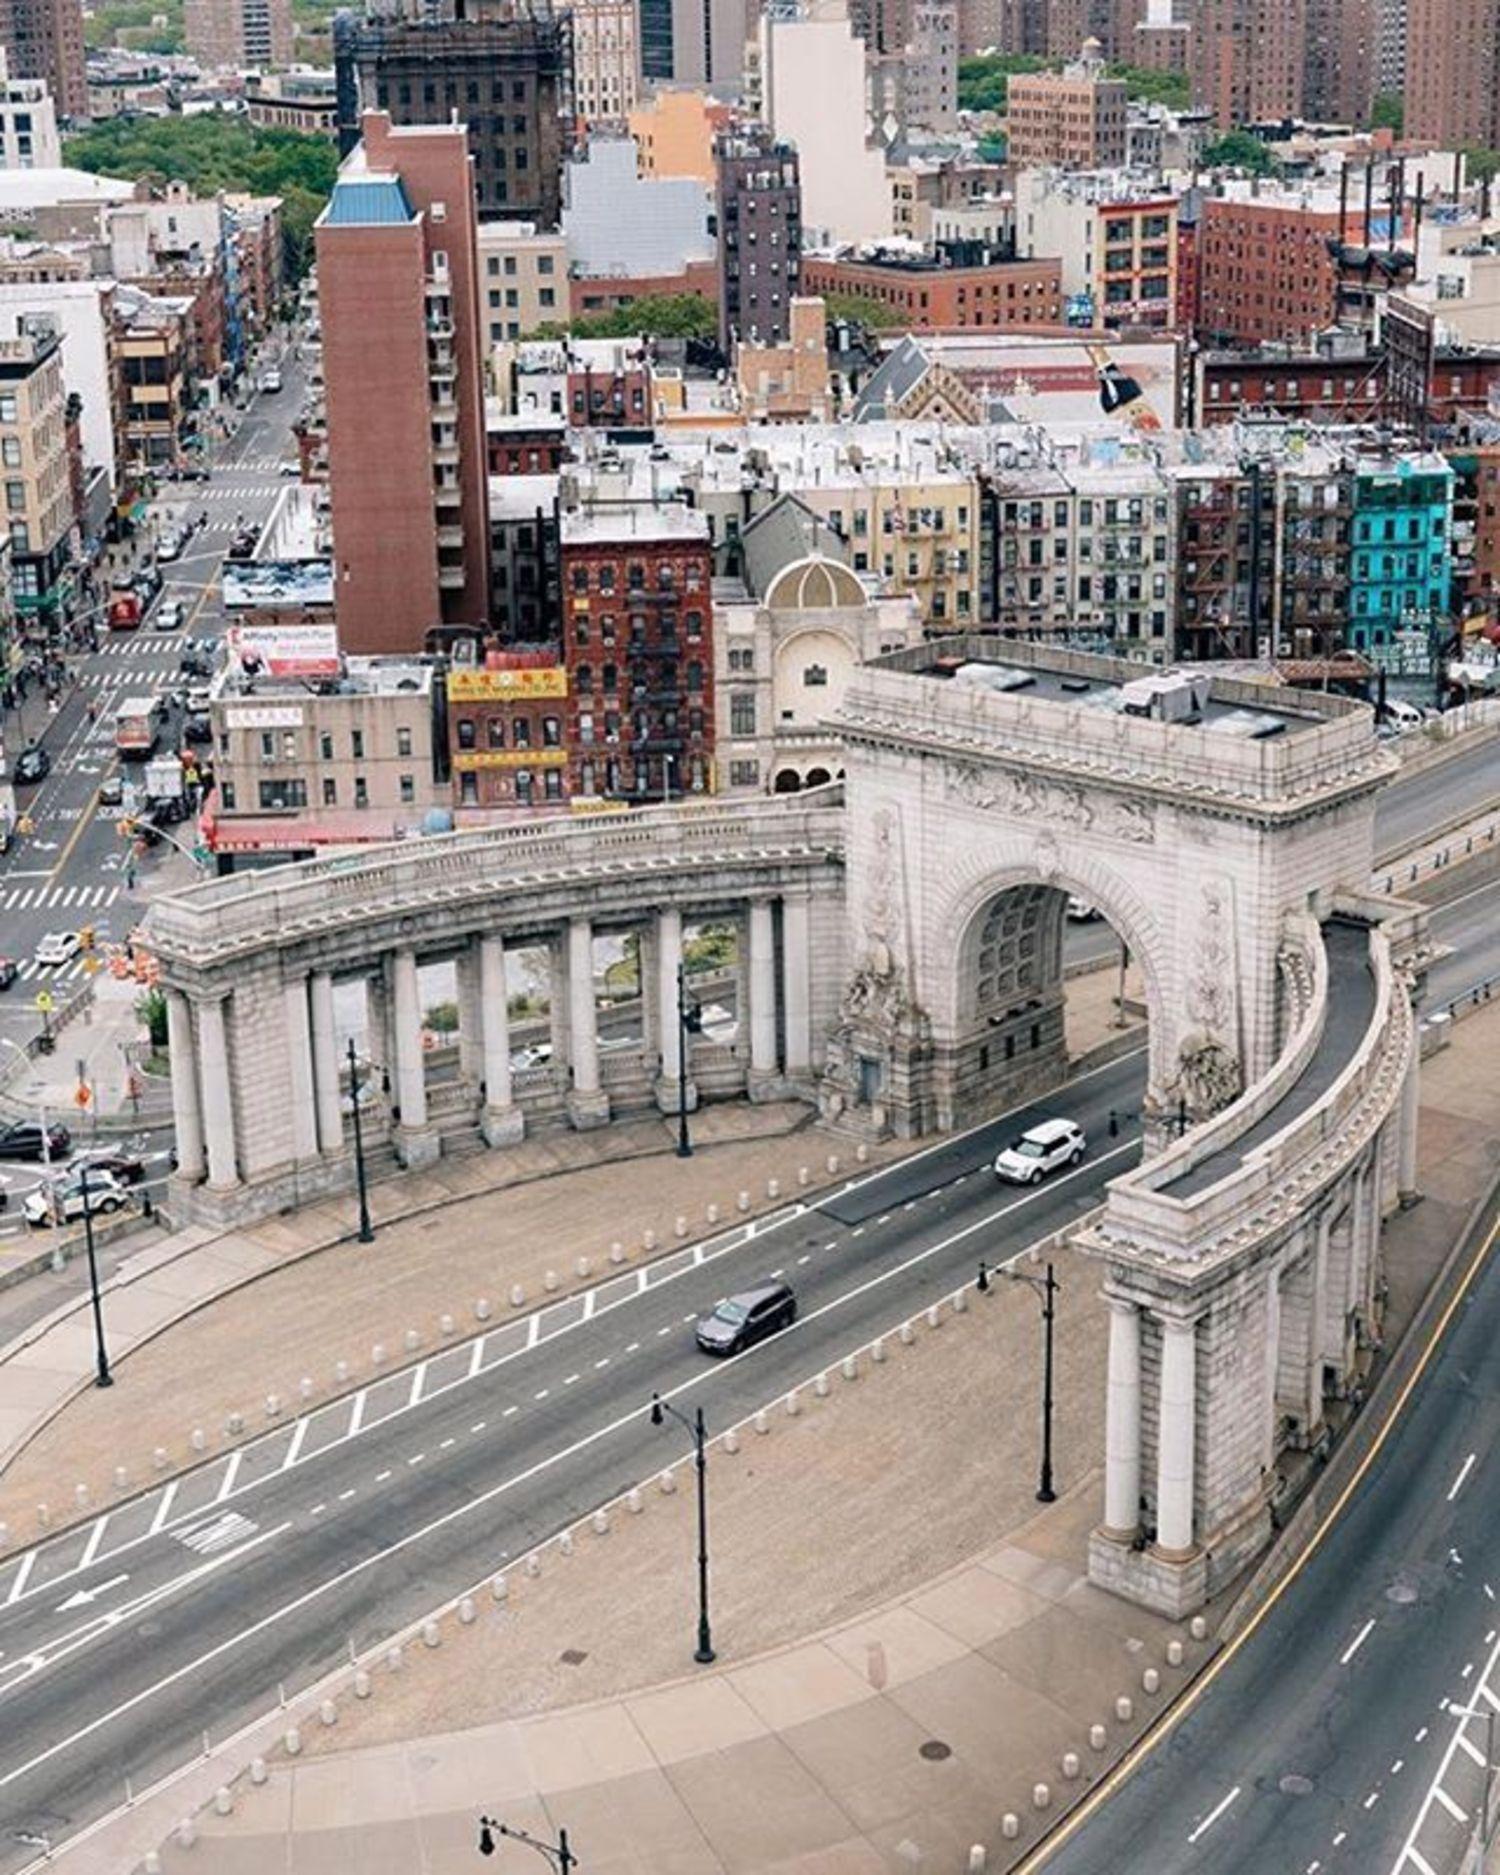 Manhattan Bridge, New York, New York. Photo via @denn_ice #viewingnyc #newyorkcity #newyork